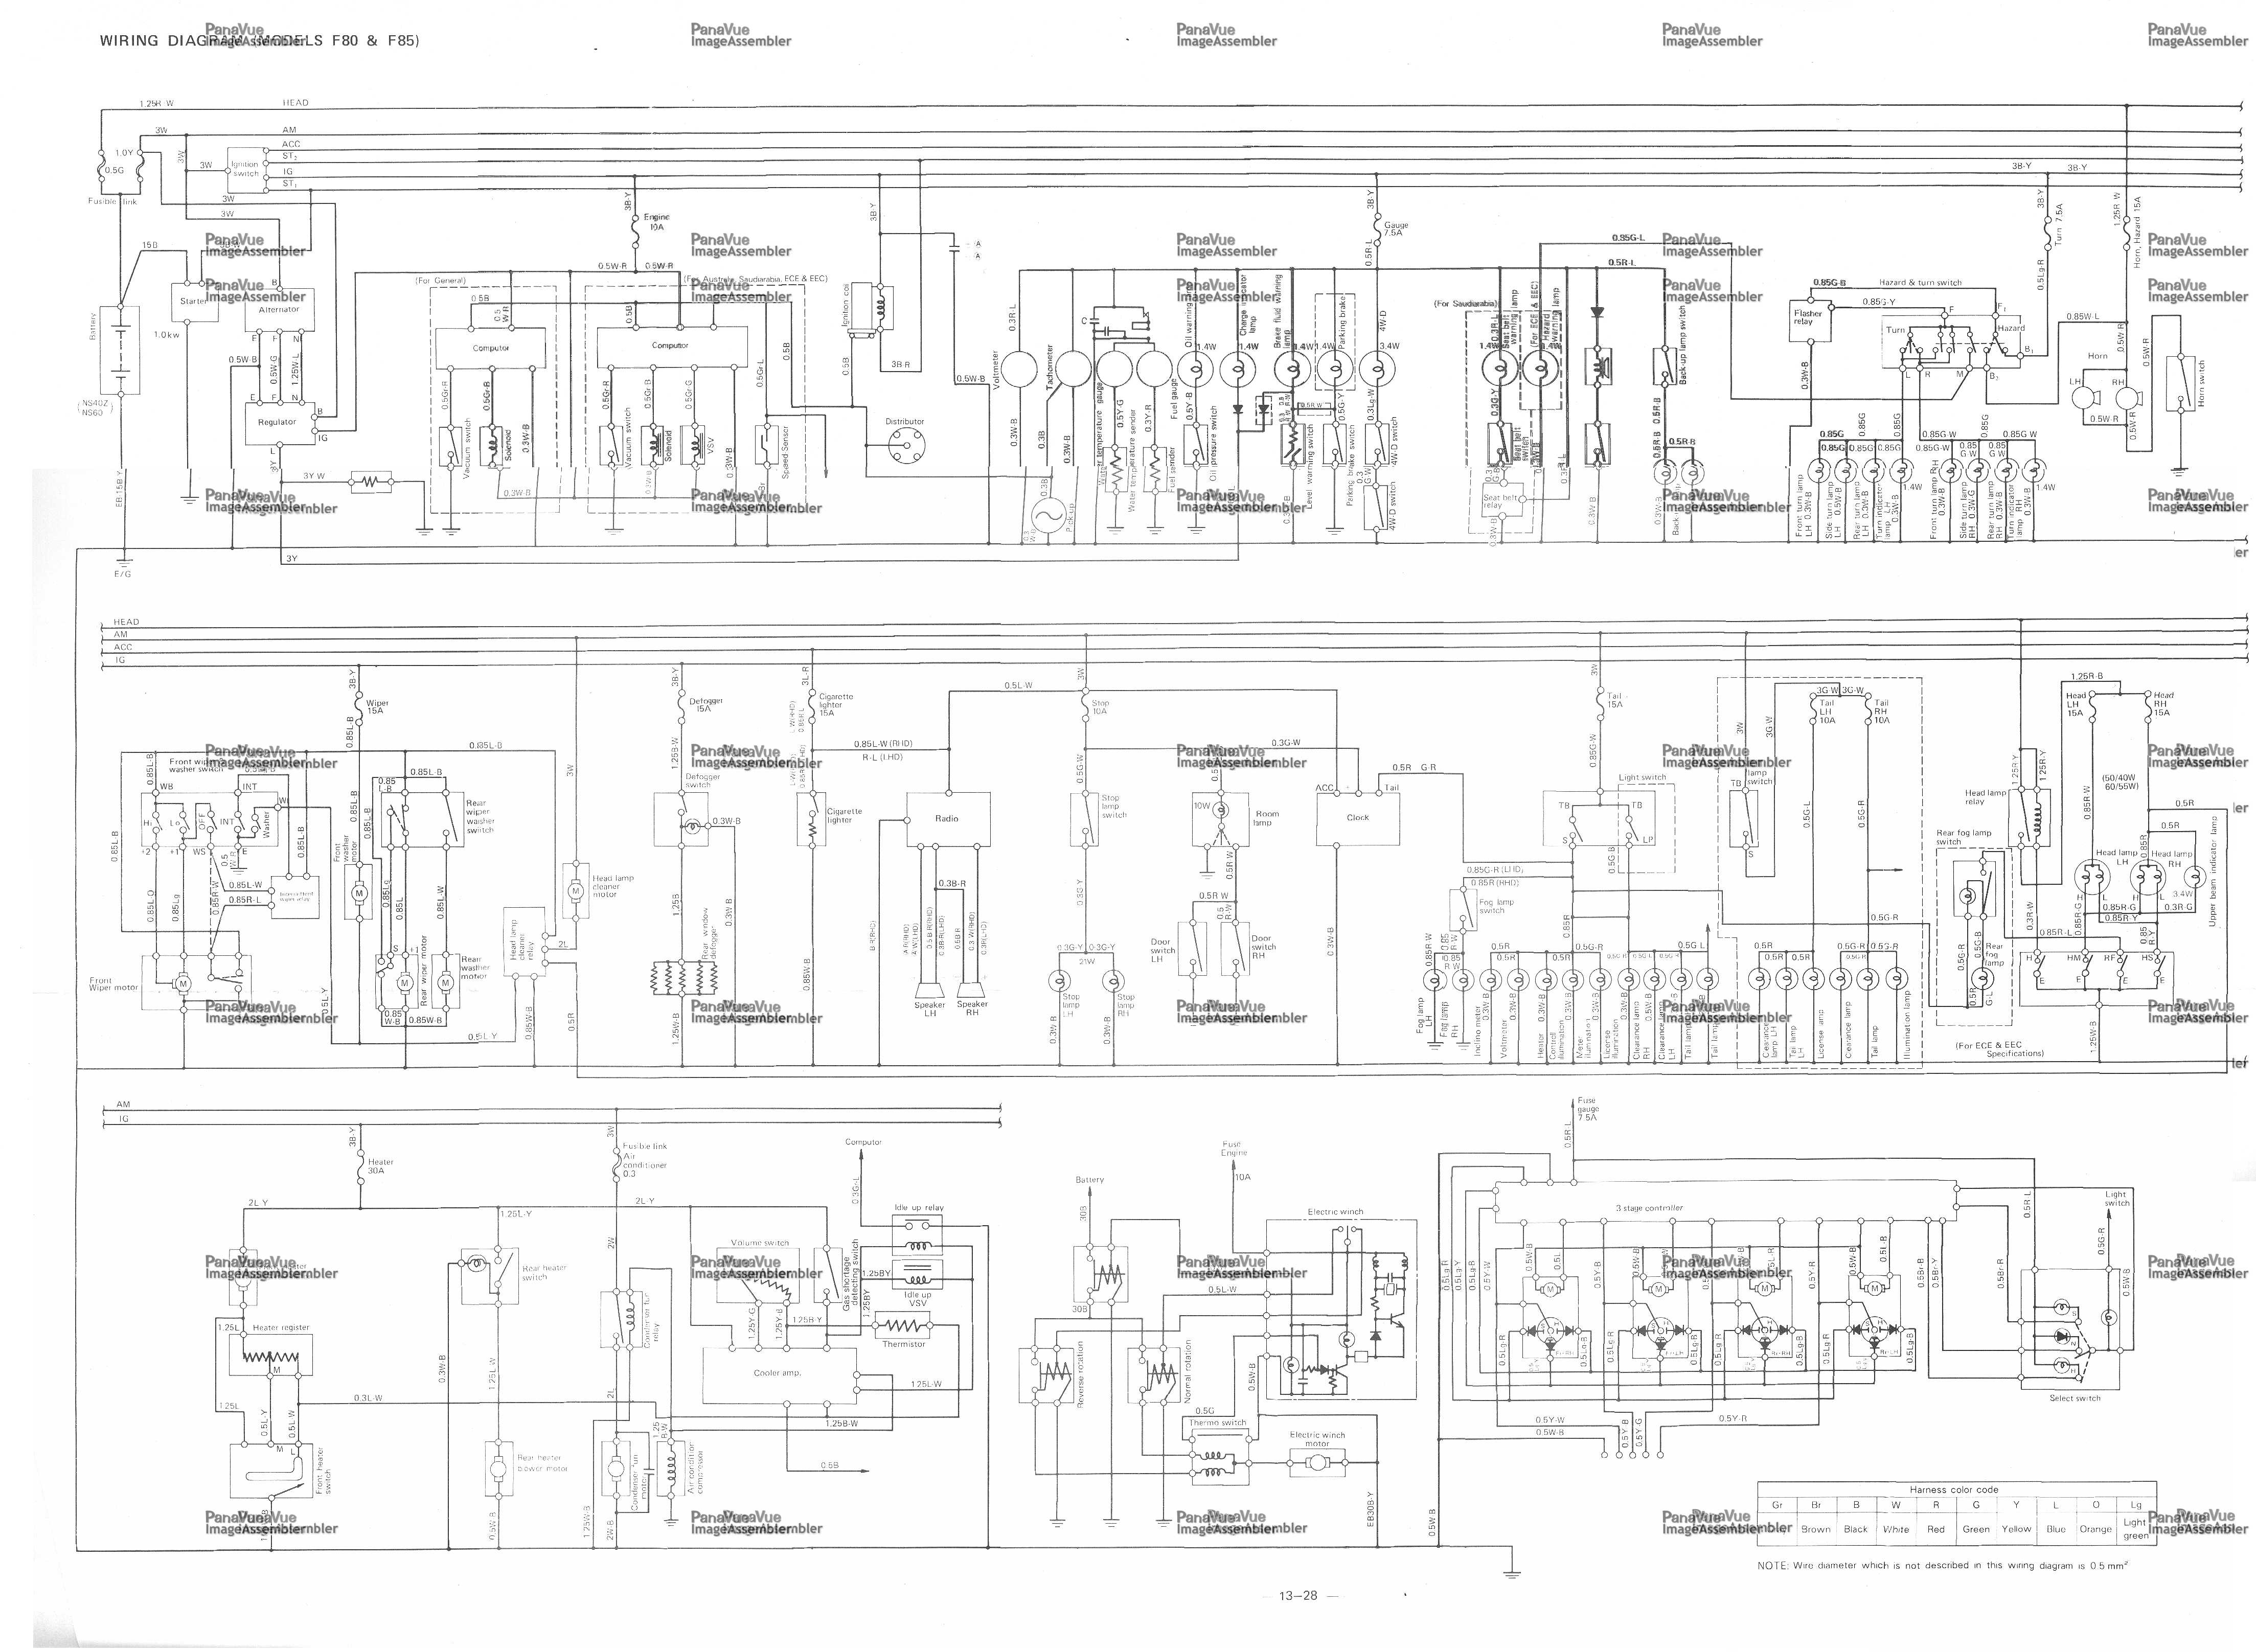 Toyota Cami Repair Manual 1986 Chevy K30 Military Truck Wiring Diagram 2002 U0027 Array Auto Daihatsu Yrv Rh Froauto Blogspot Com